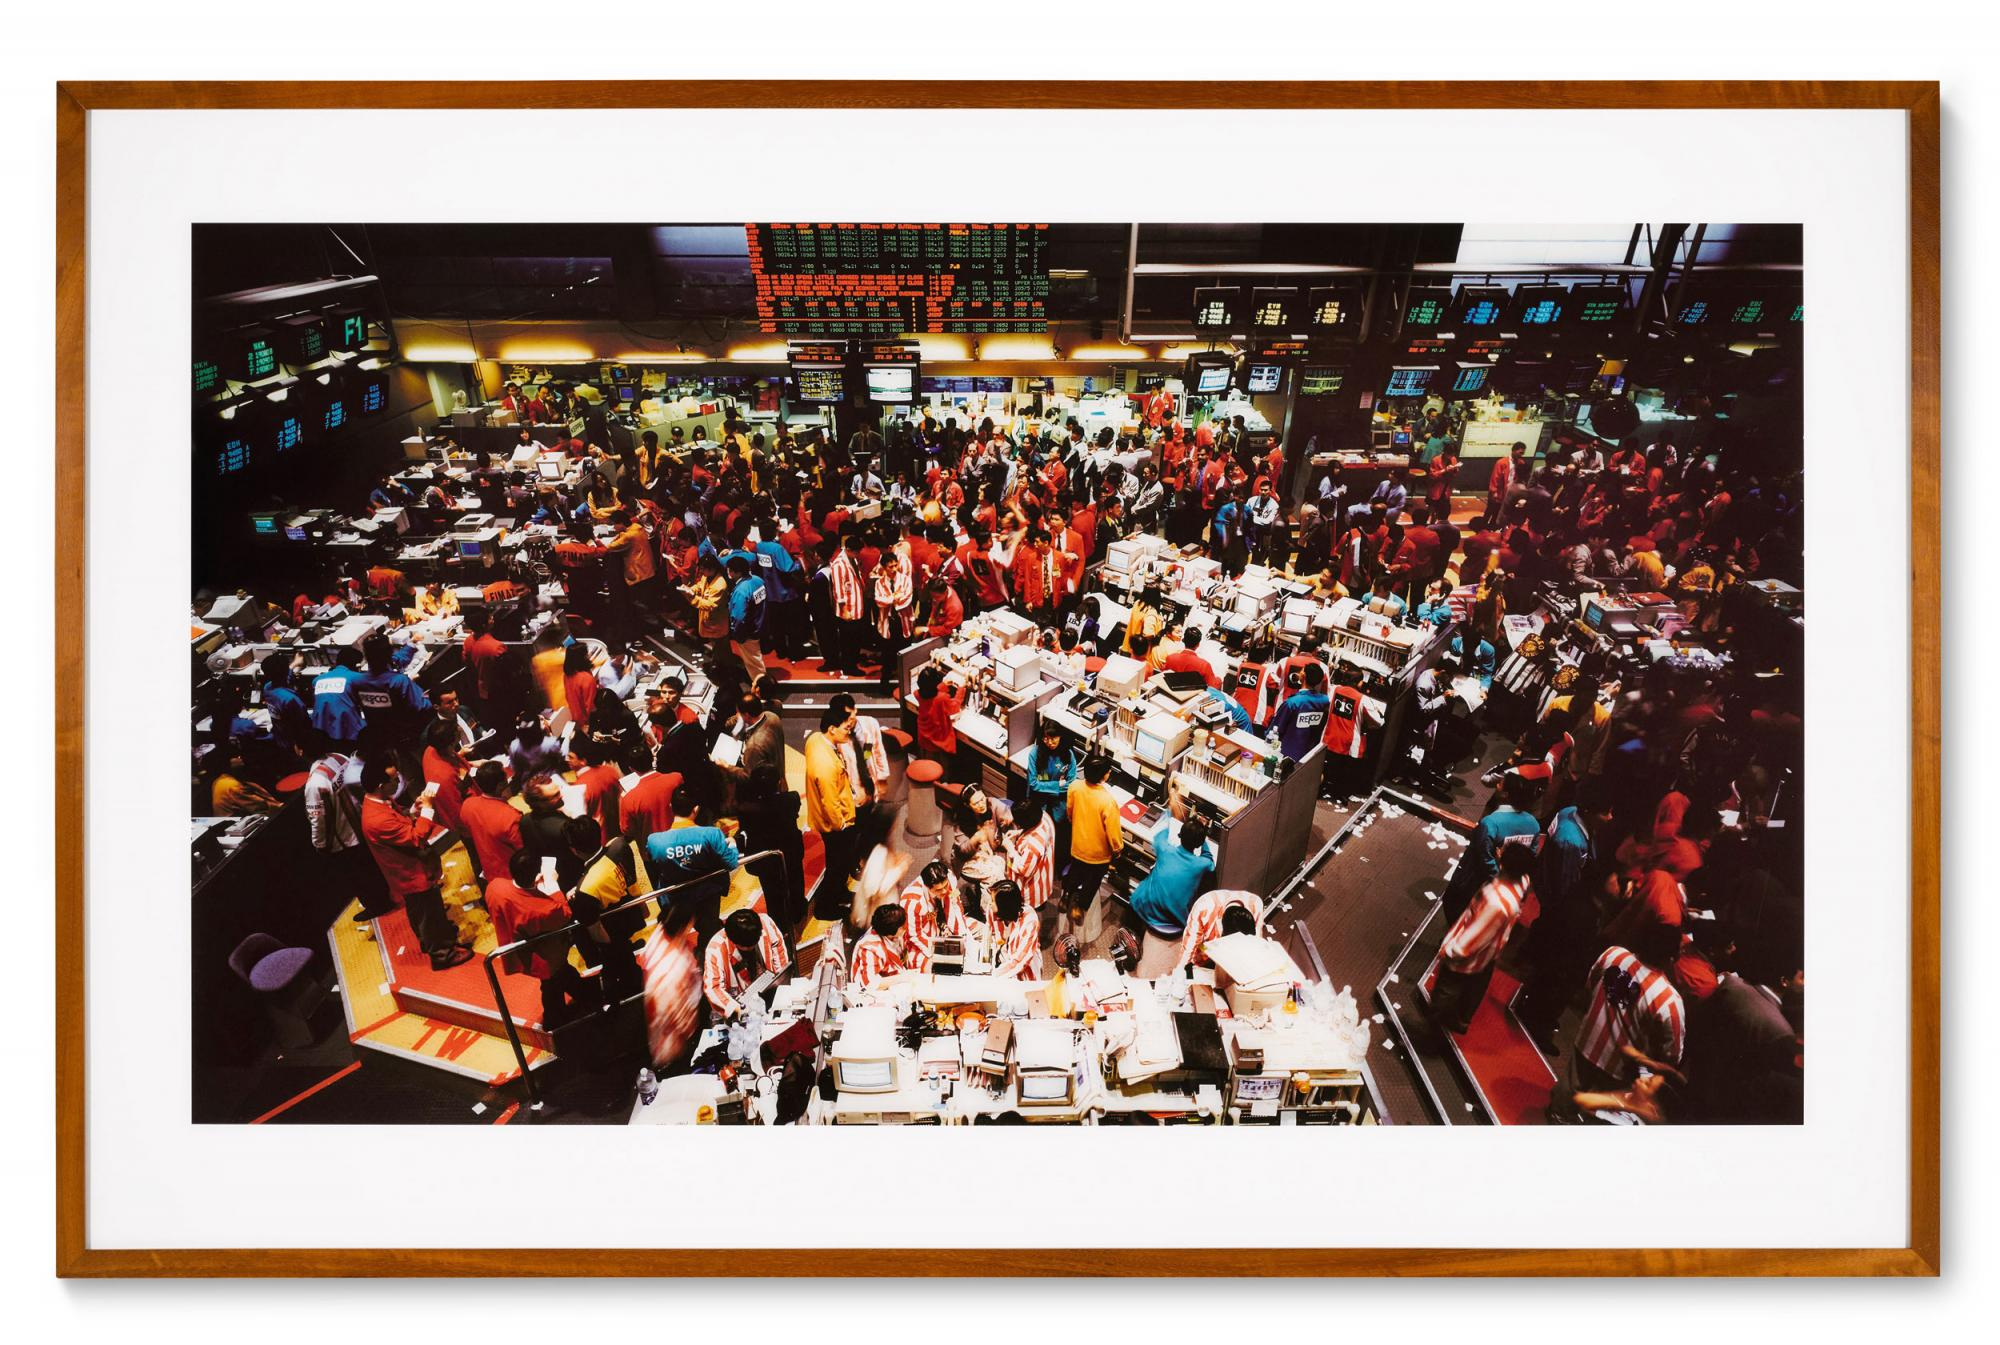 Lot-143,-Andreas-Gursky,-Singapore-Börse,-est.jpg